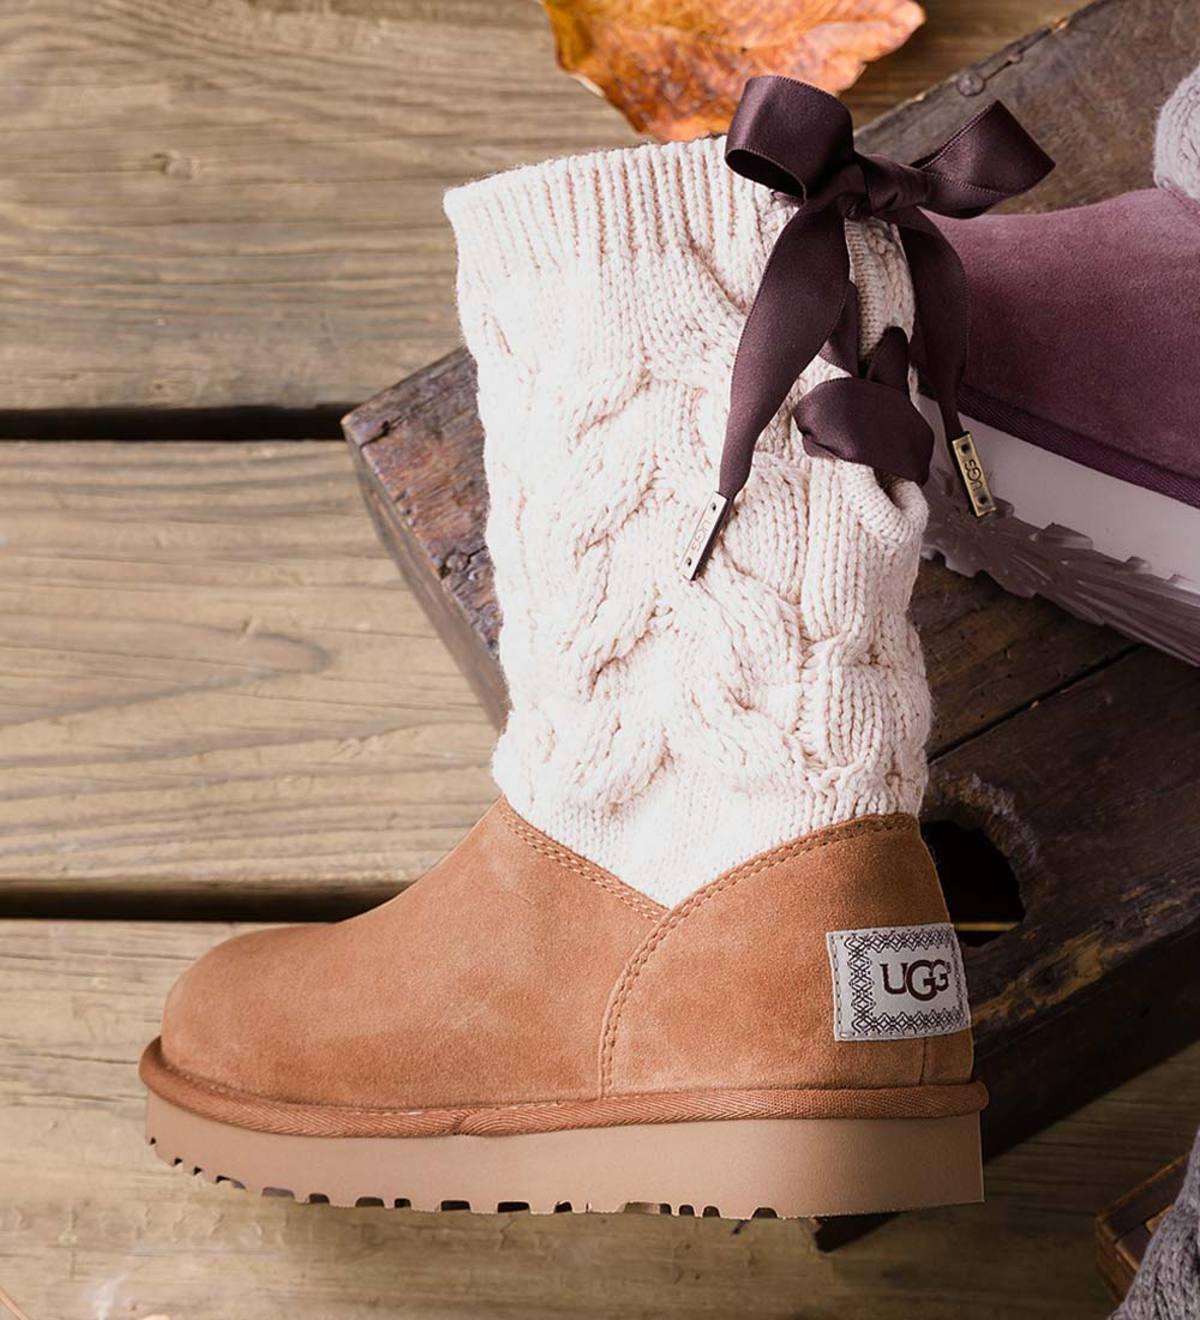 b138793ebe7 UGG Kiandra Boots | PlowHearth